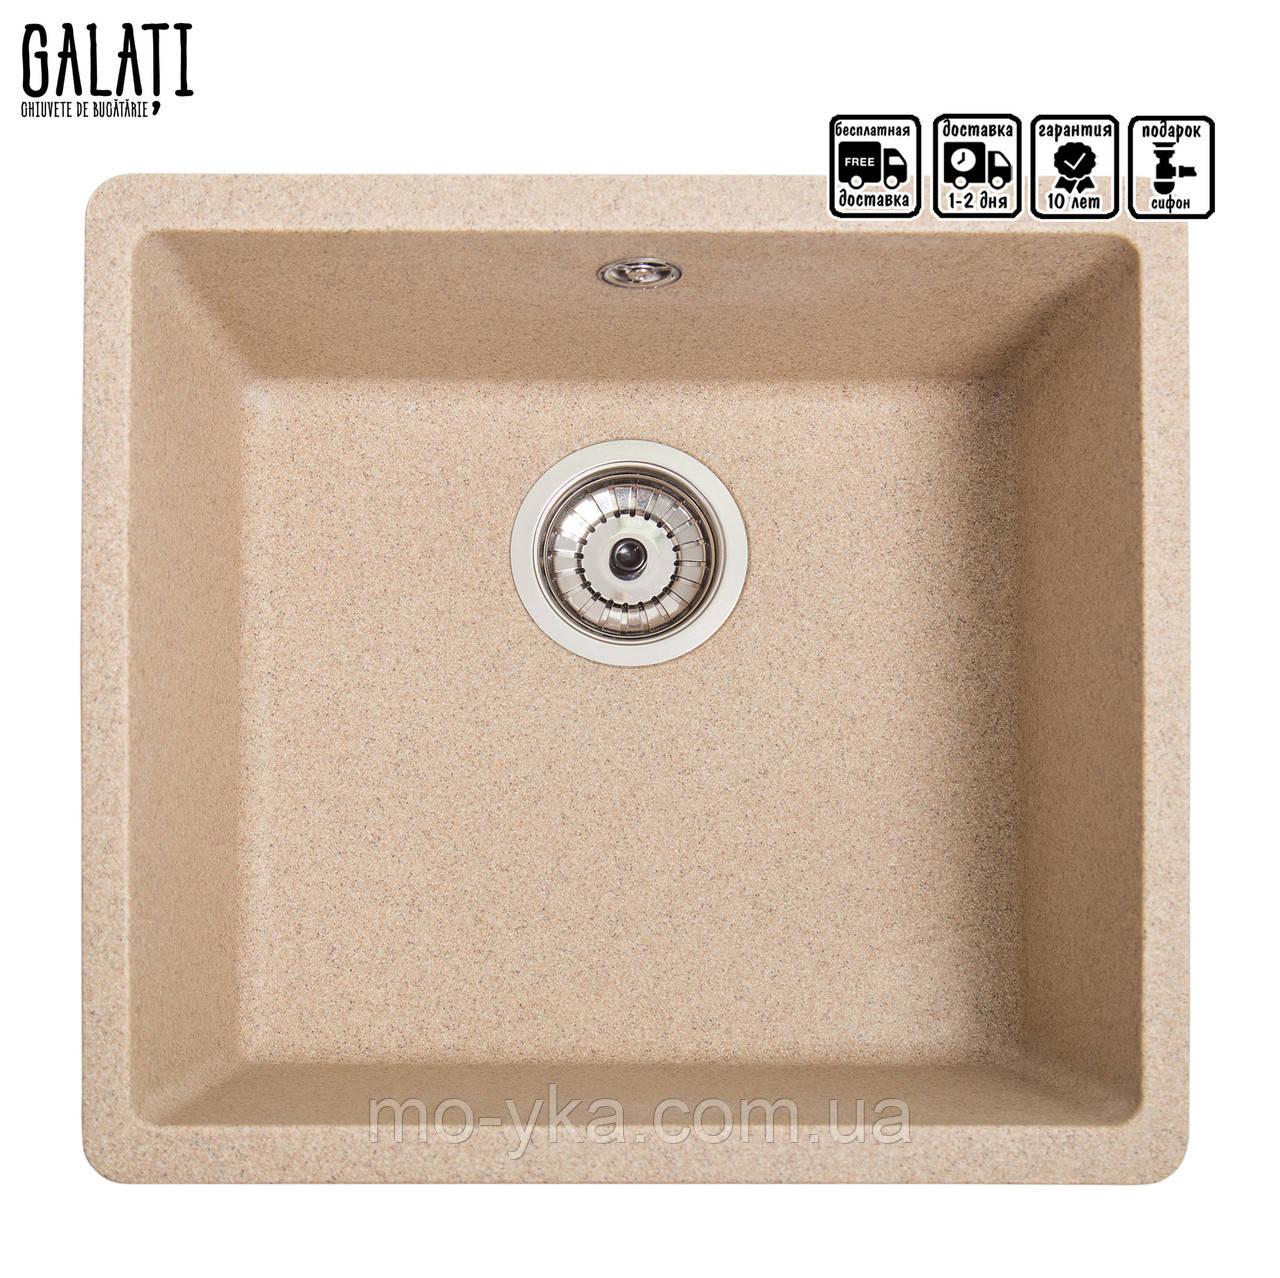 Гранитная кухонная мойка Galati Mira U-400